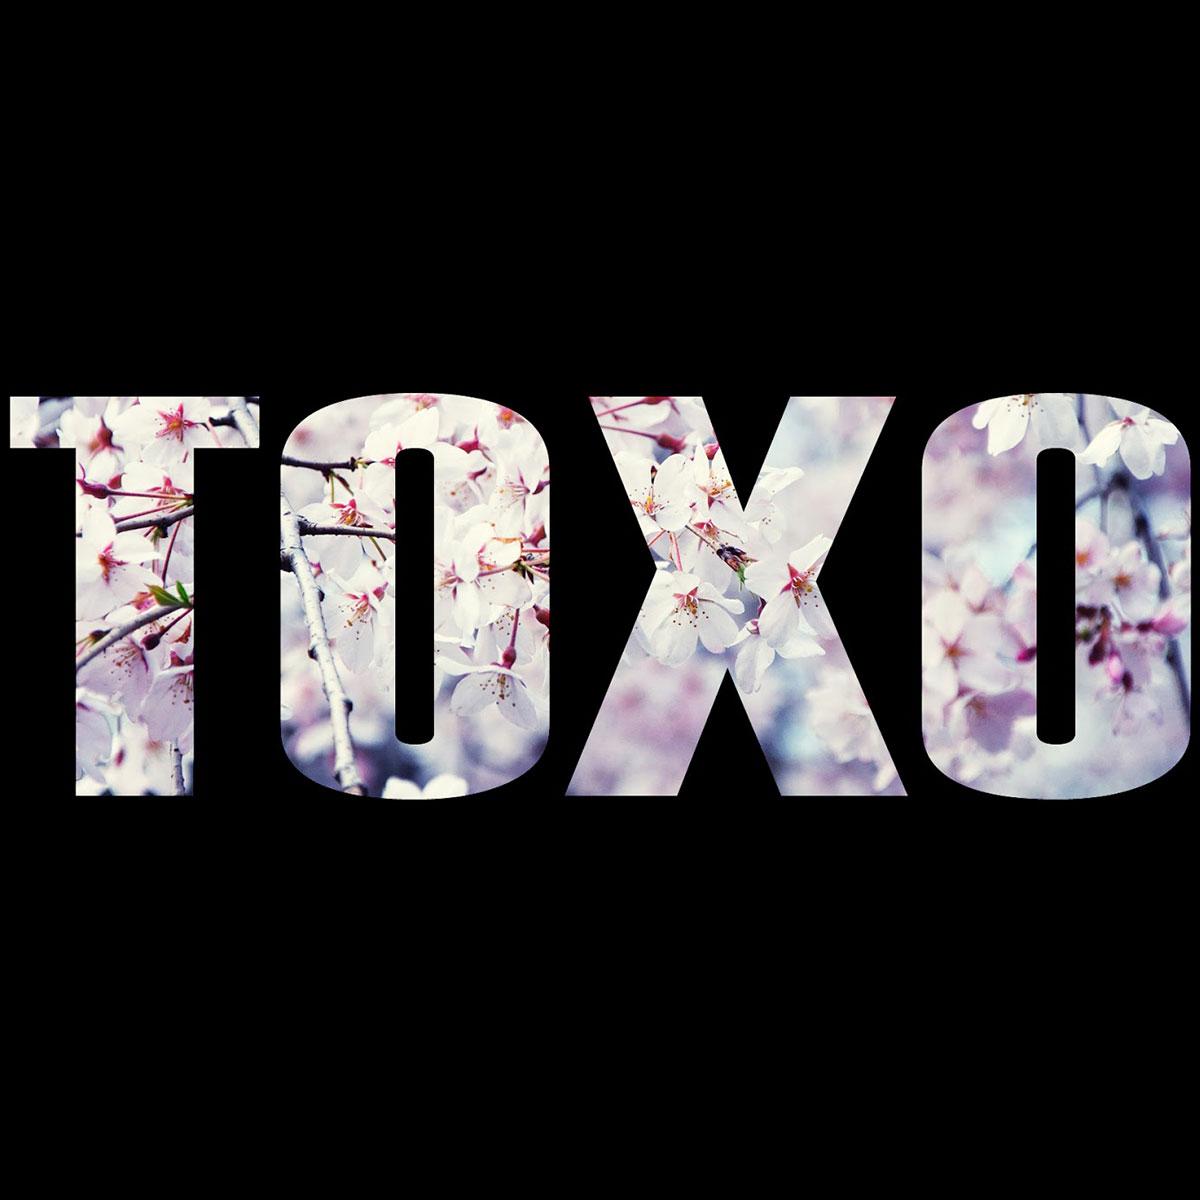 Toxo Music